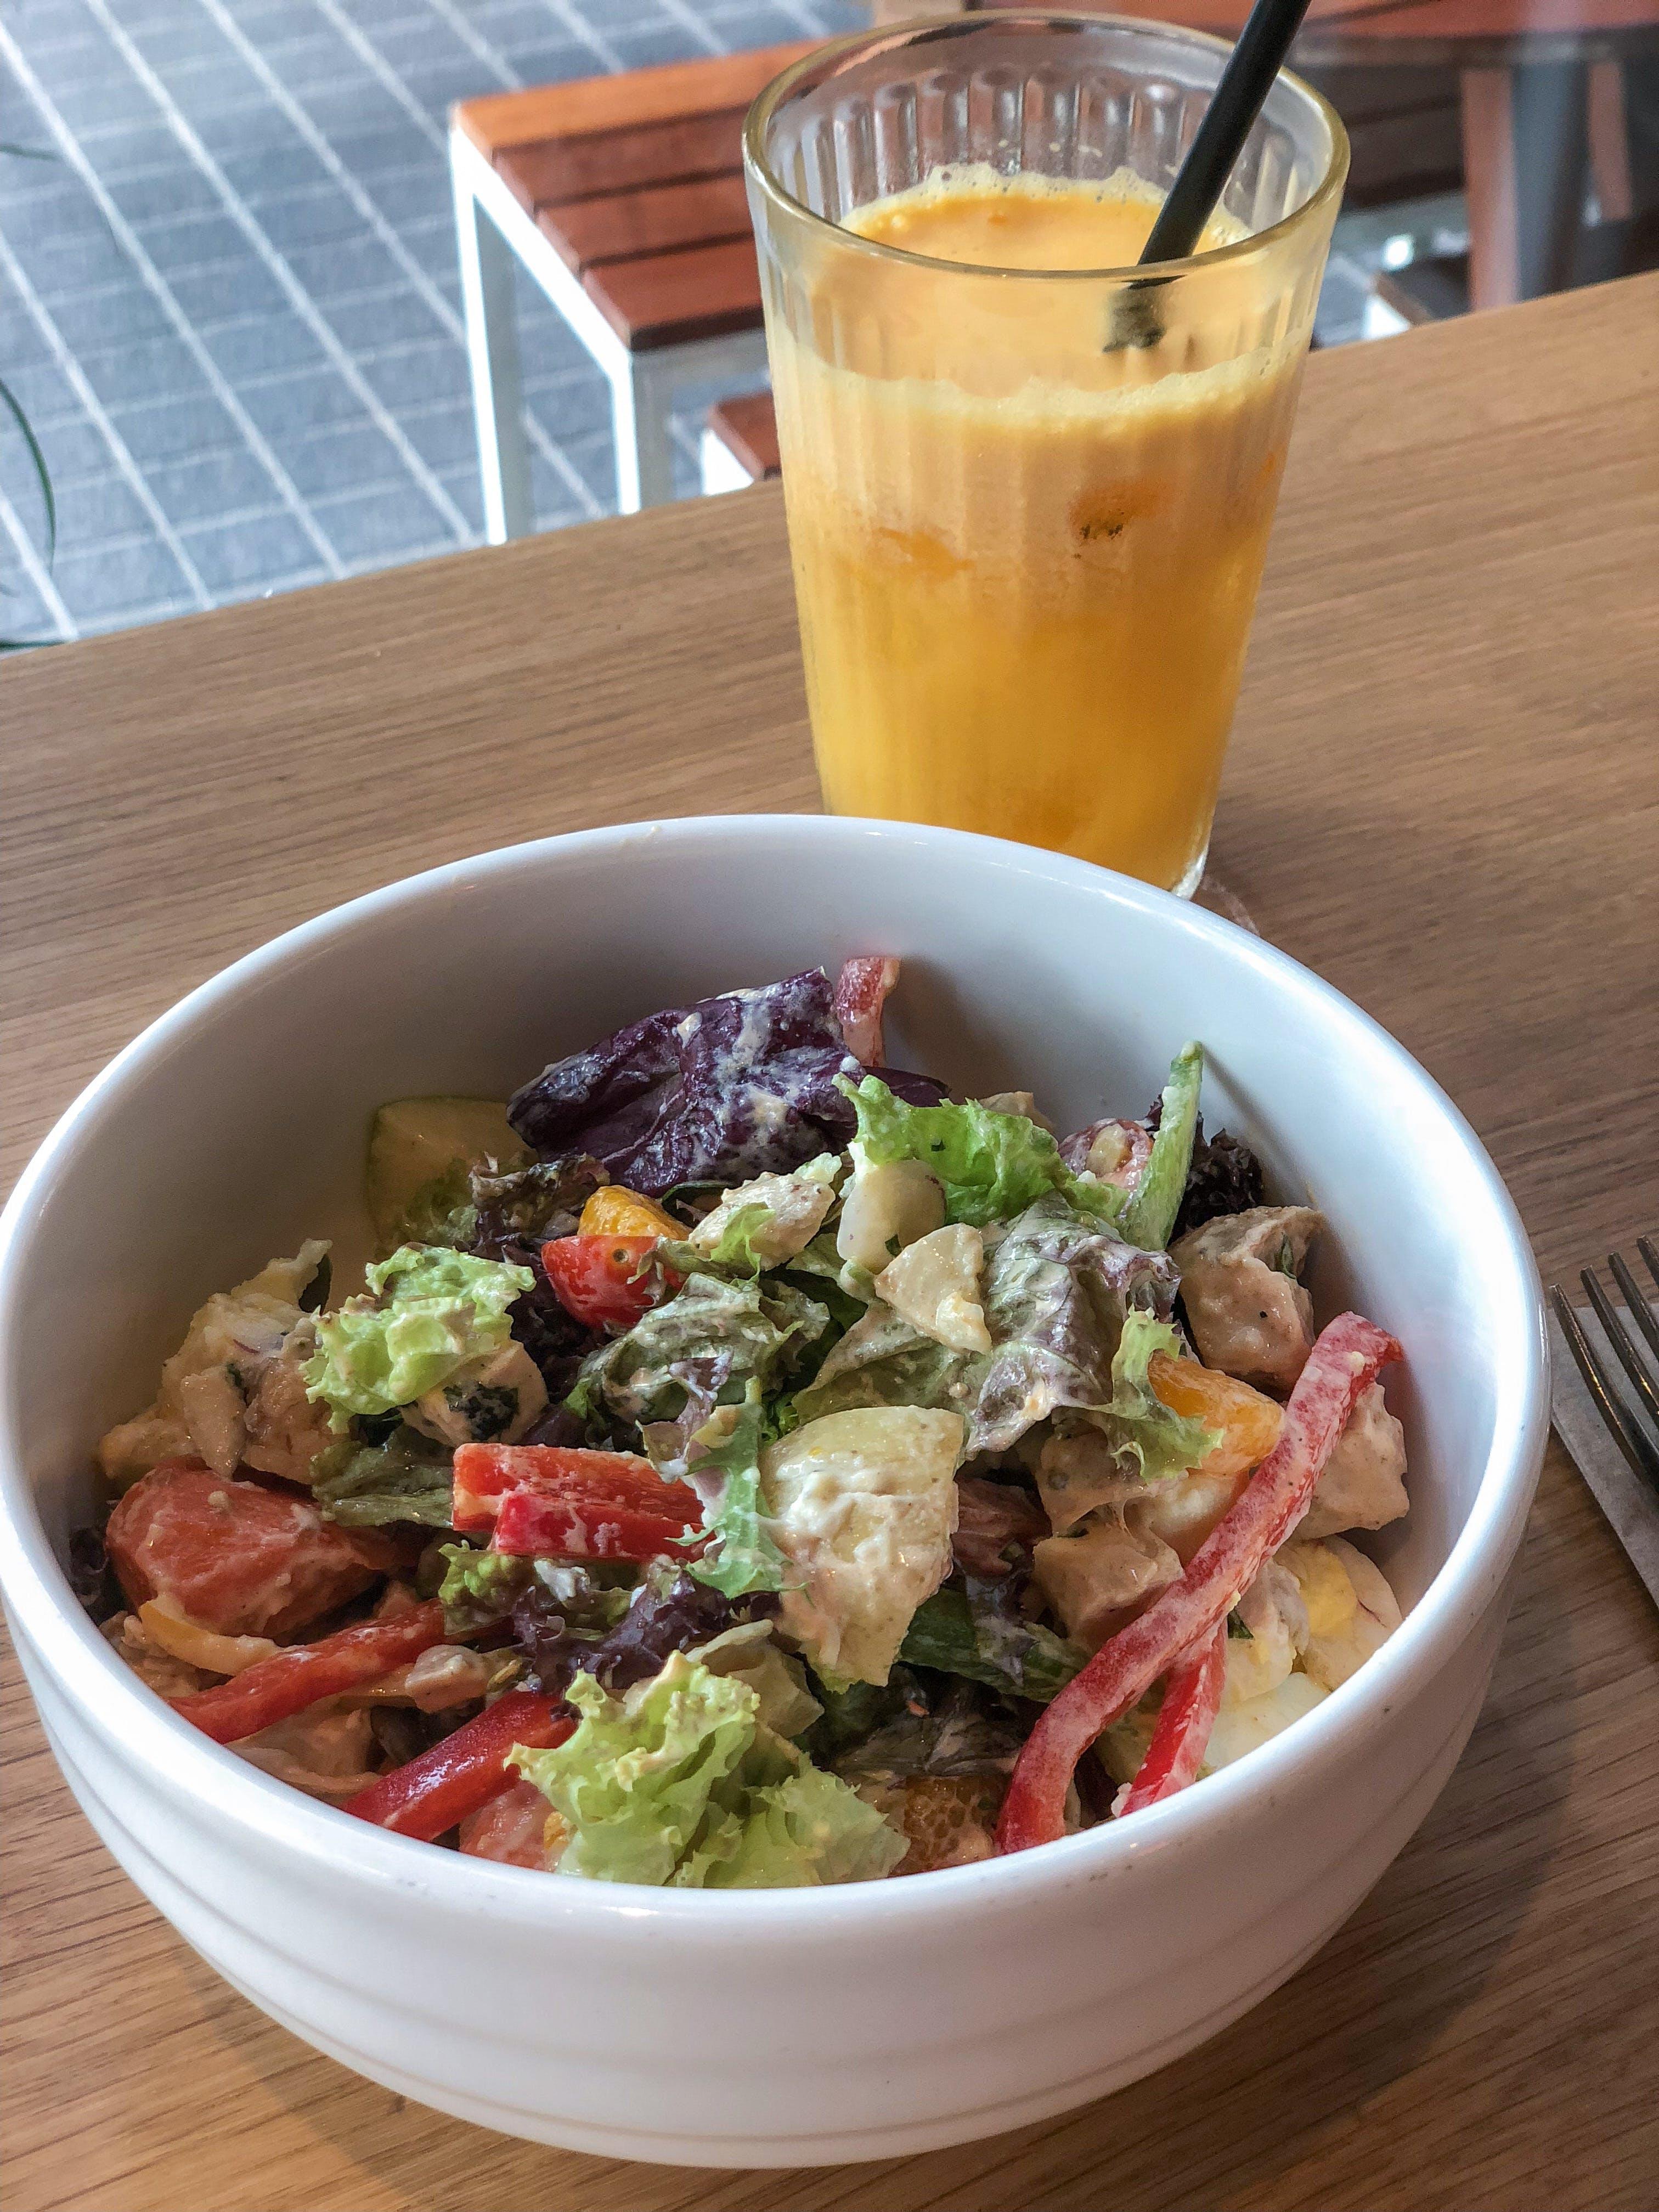 Free stock photo of eating healthy, orange juice, salad